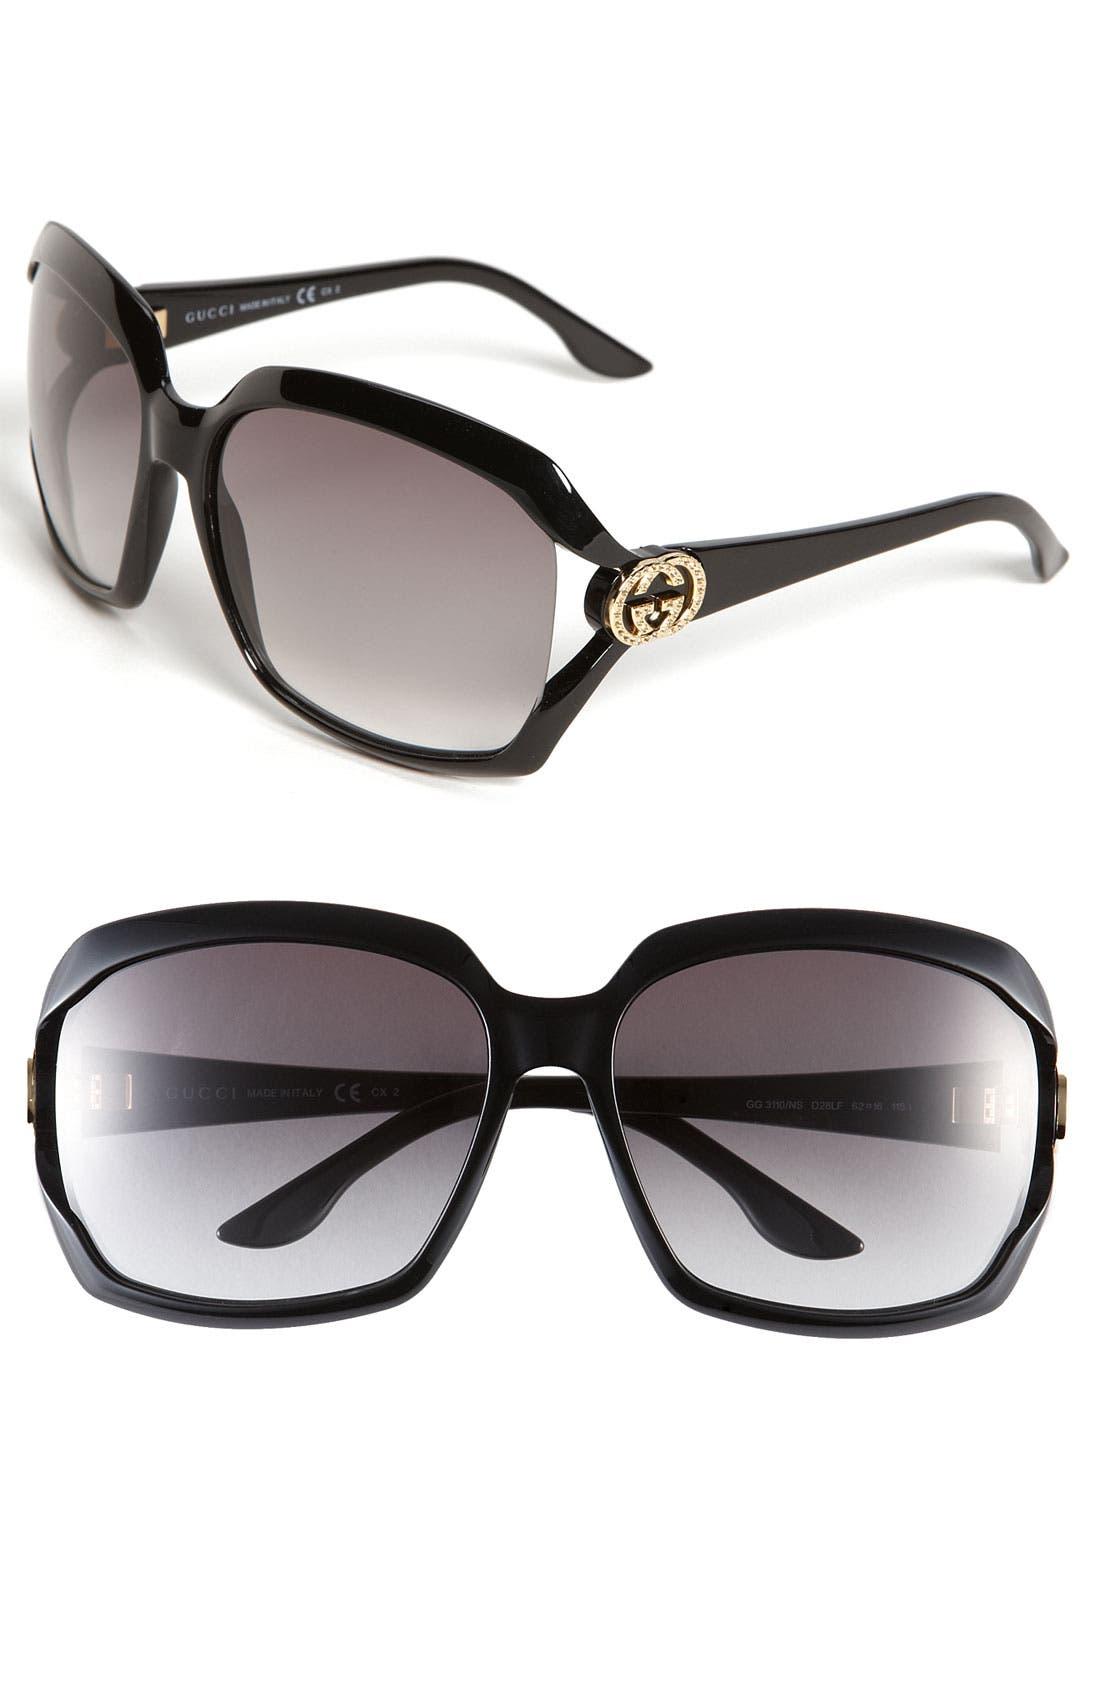 Main Image - Gucci Oversized Sunglasses